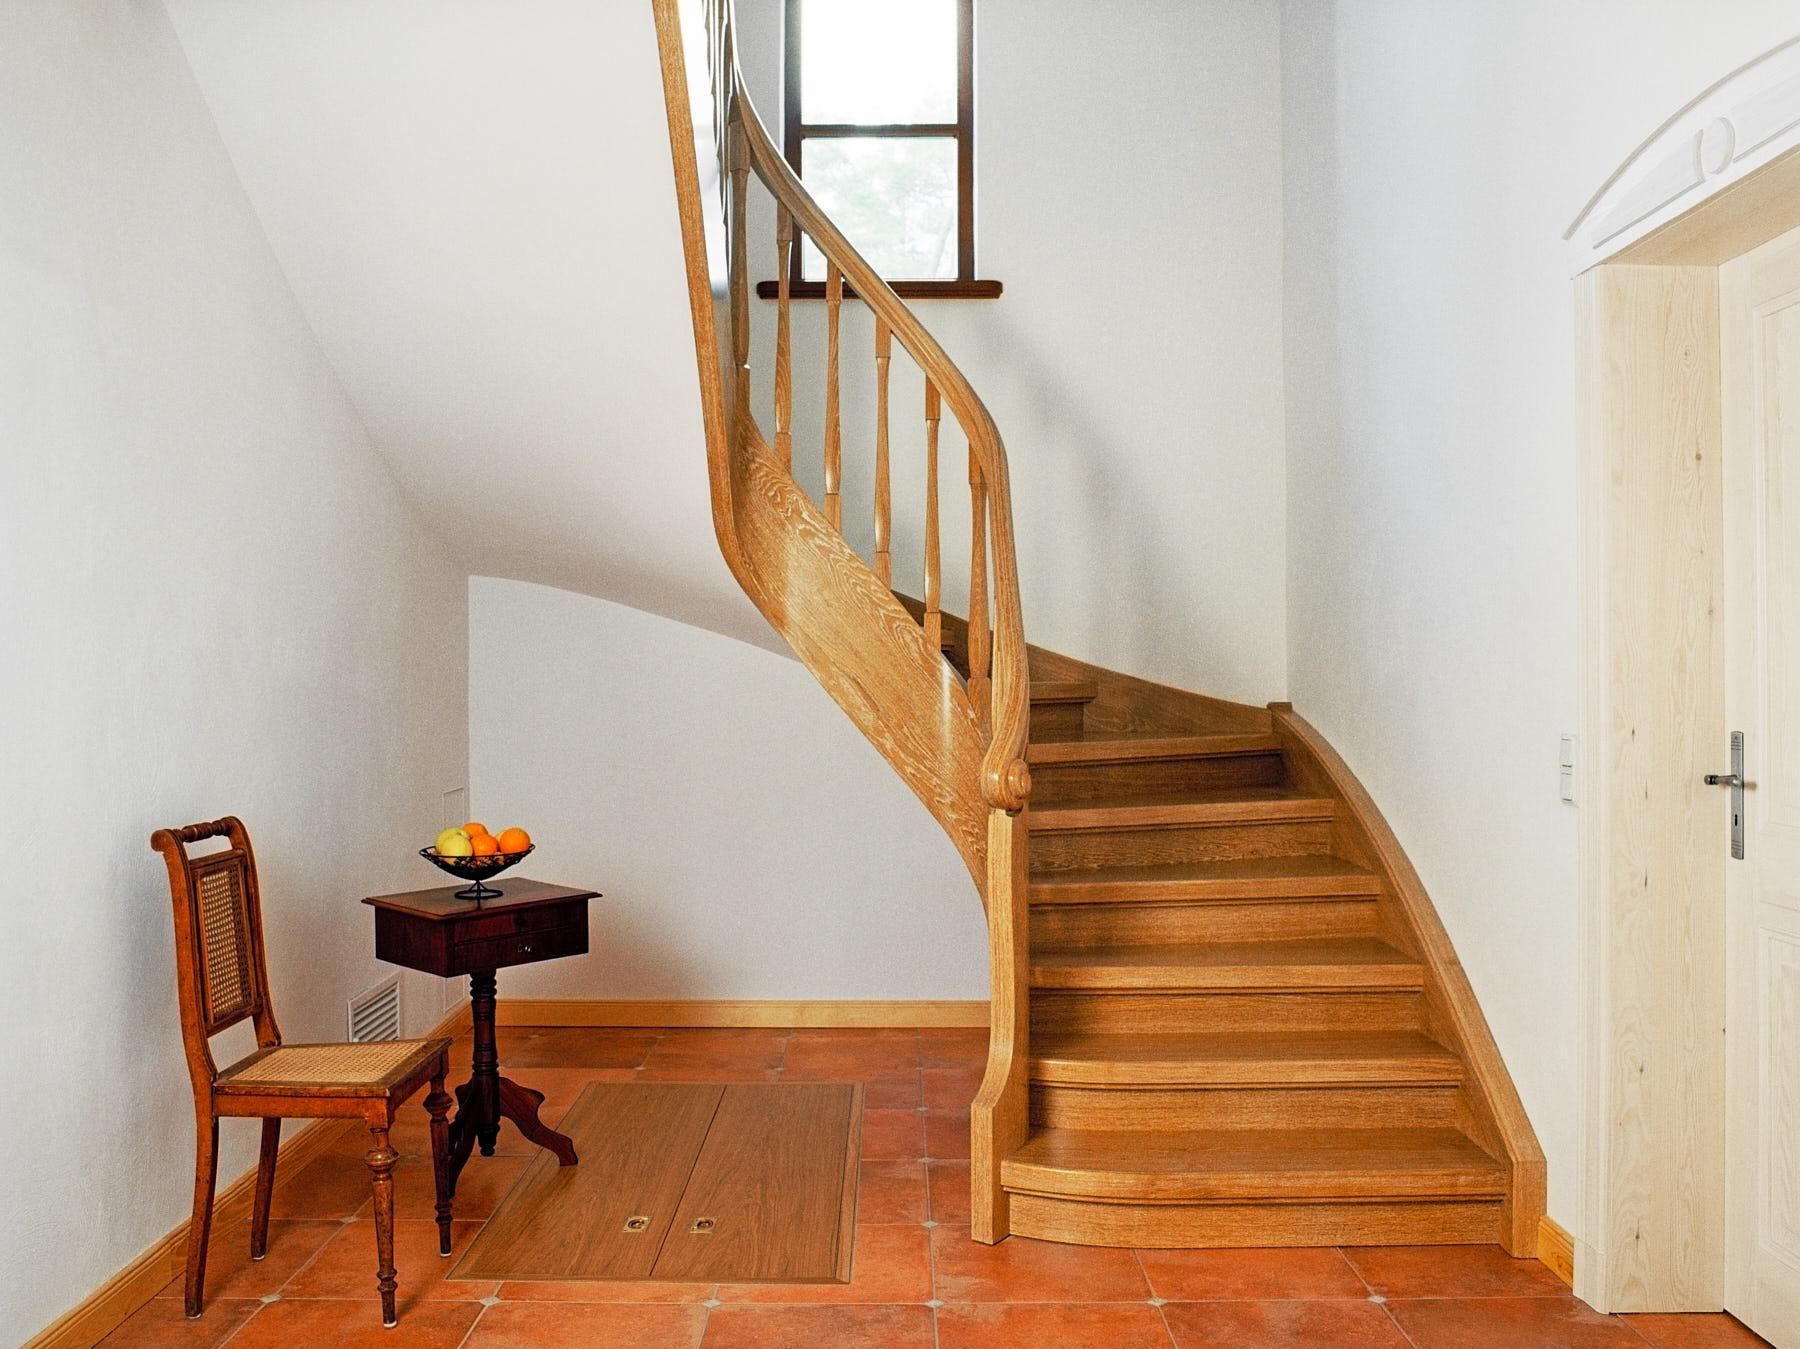 treppe-aus-gekalktes-eichenholz